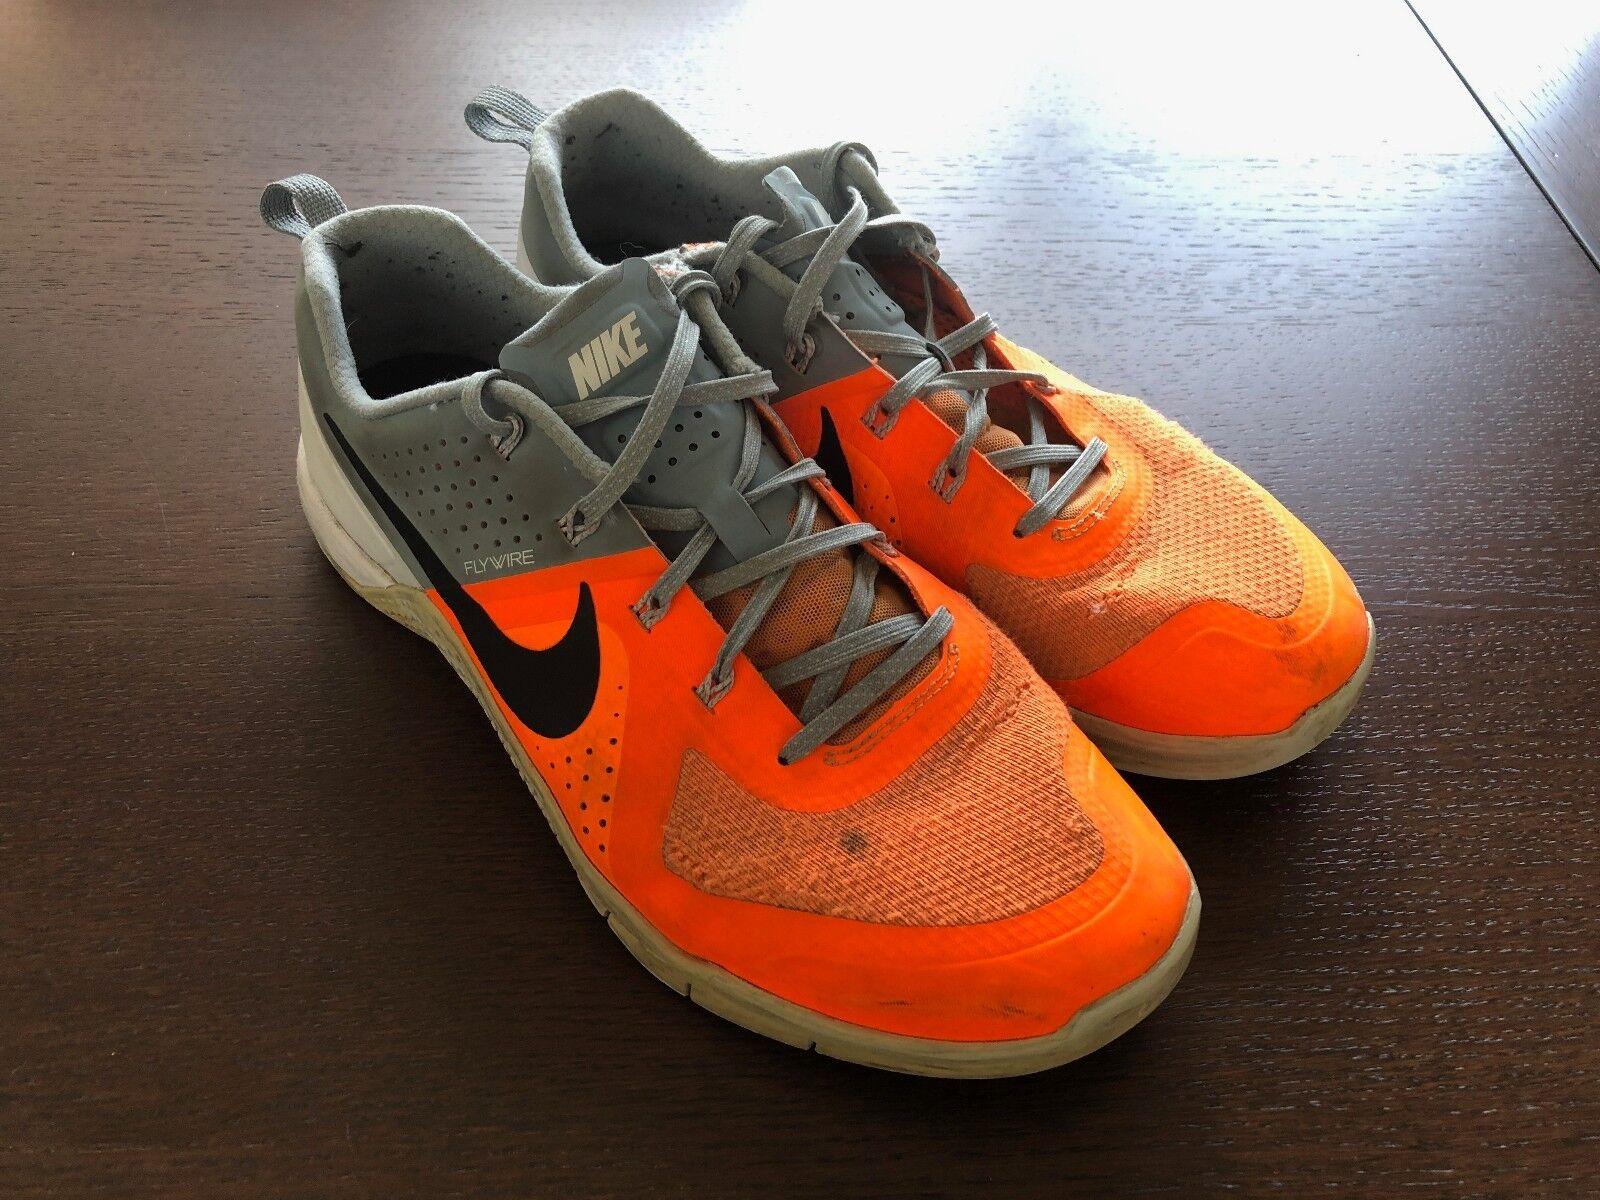 online retailer 13a45 5f4b3 ... Nike Nike Nike Metcon Orange Grey size 11 8d190e